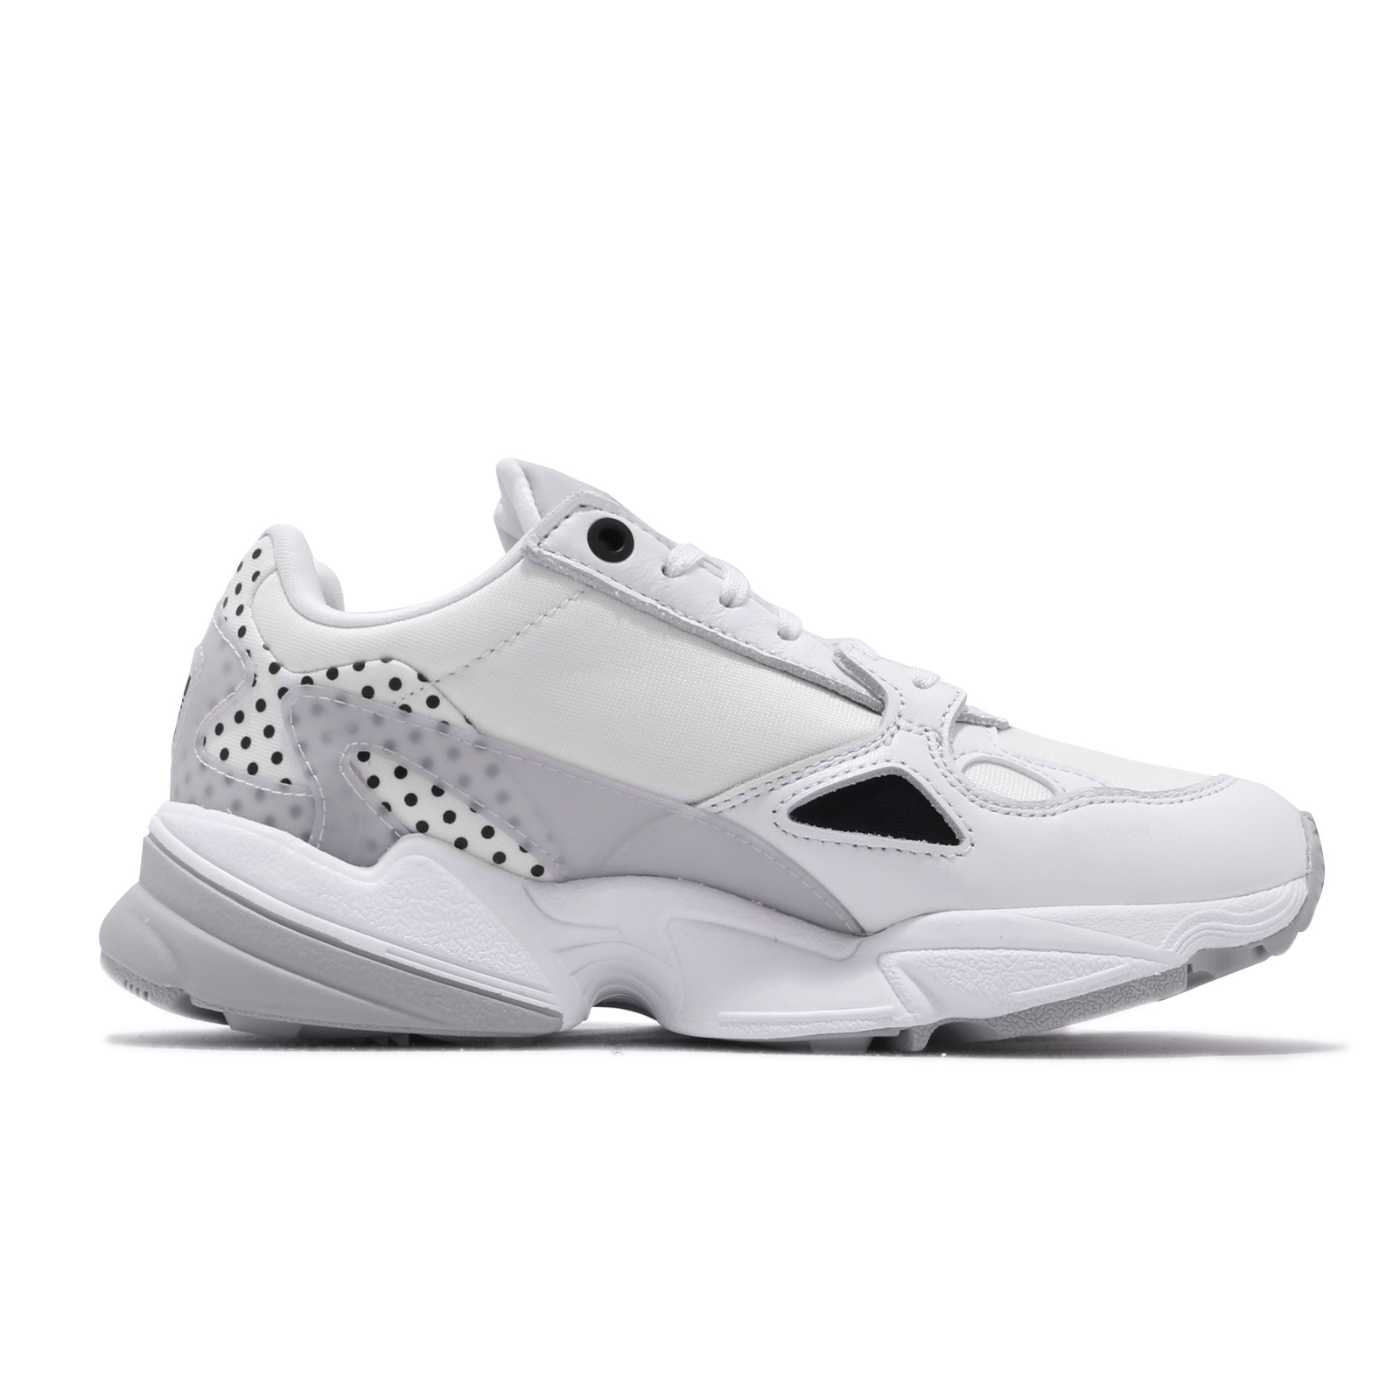 adidas 休閒鞋 Falcon 老爹 復古 女鞋